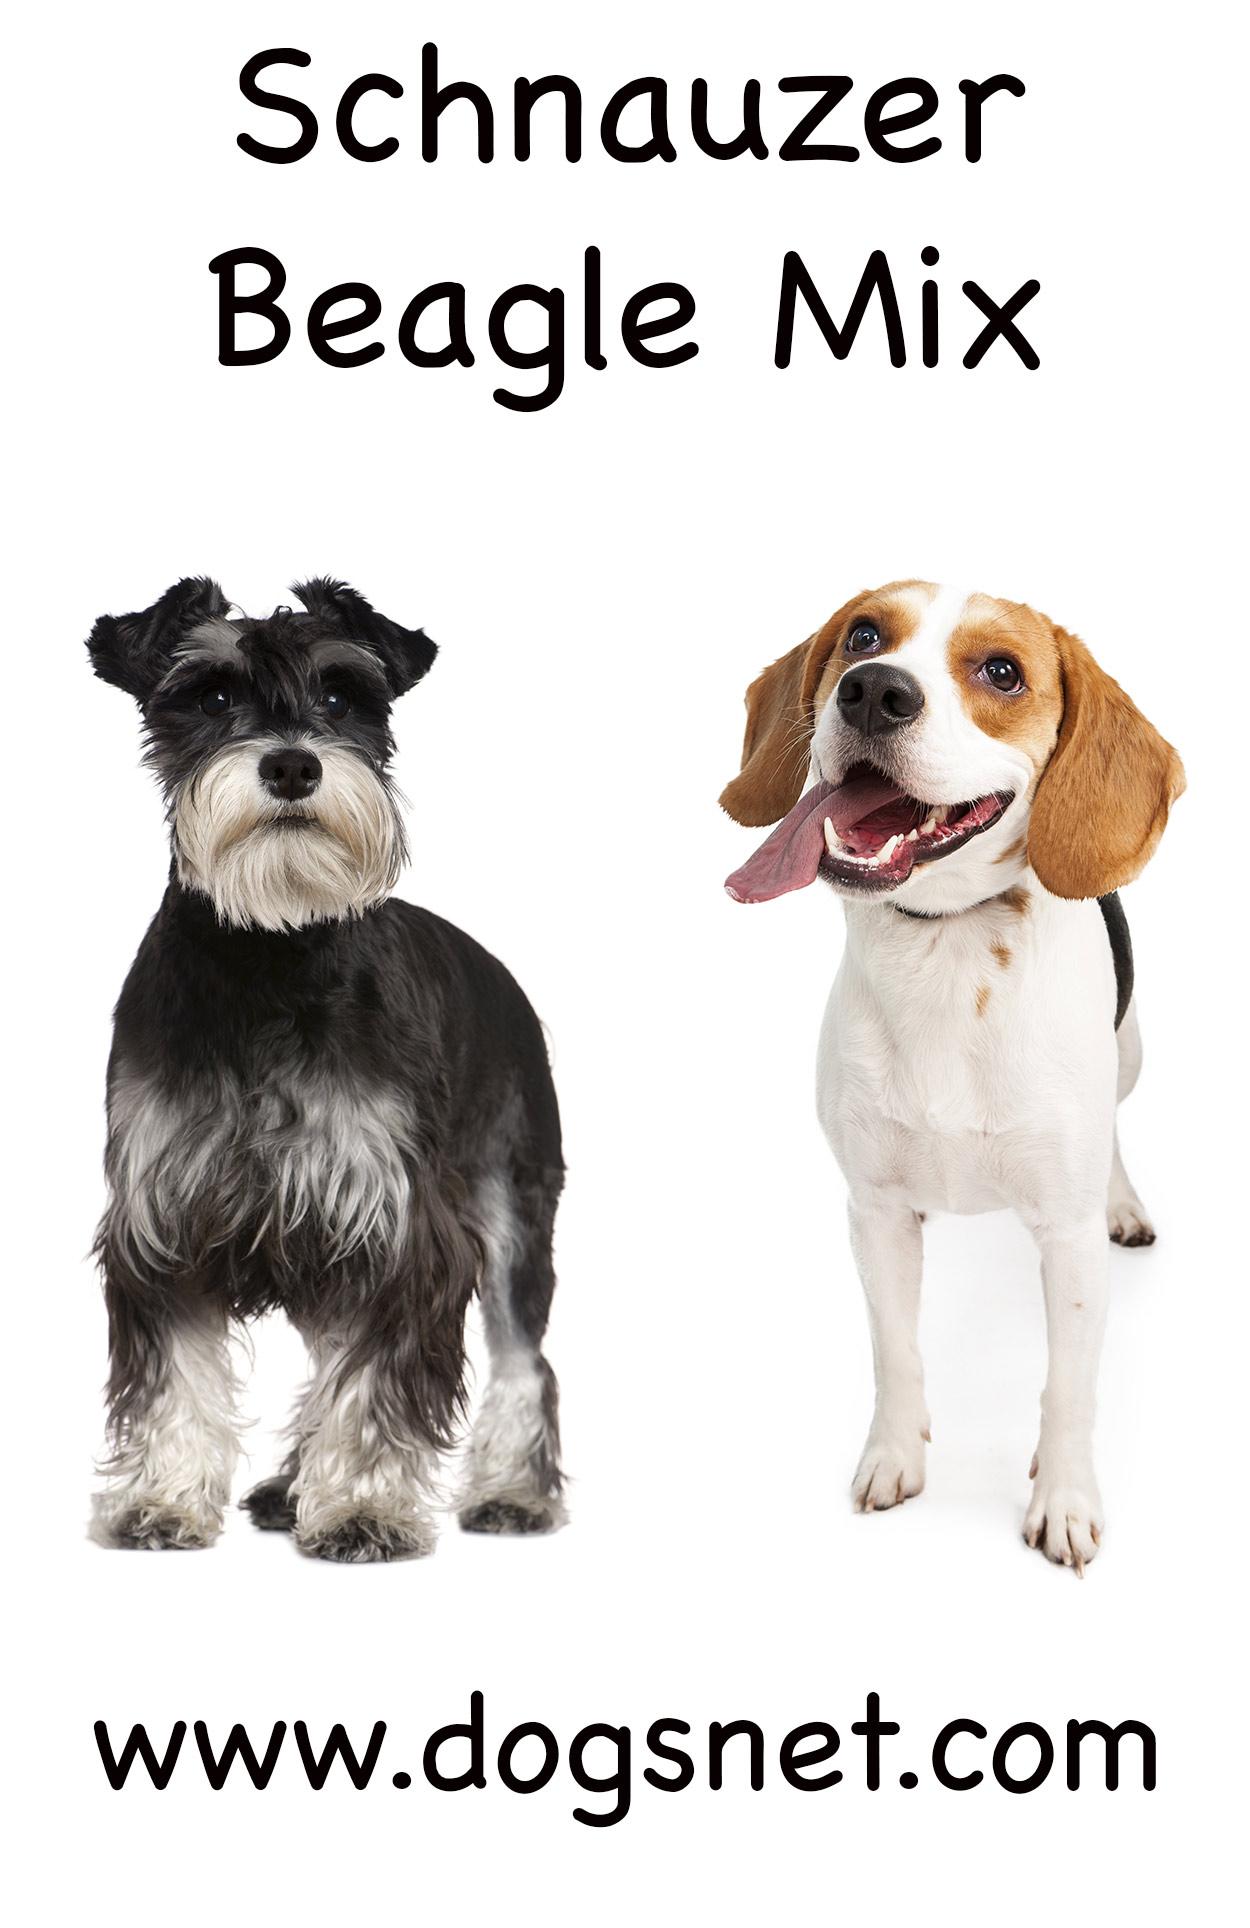 Schnauzer Beagle Mix Adorable Mix Of Beagle And